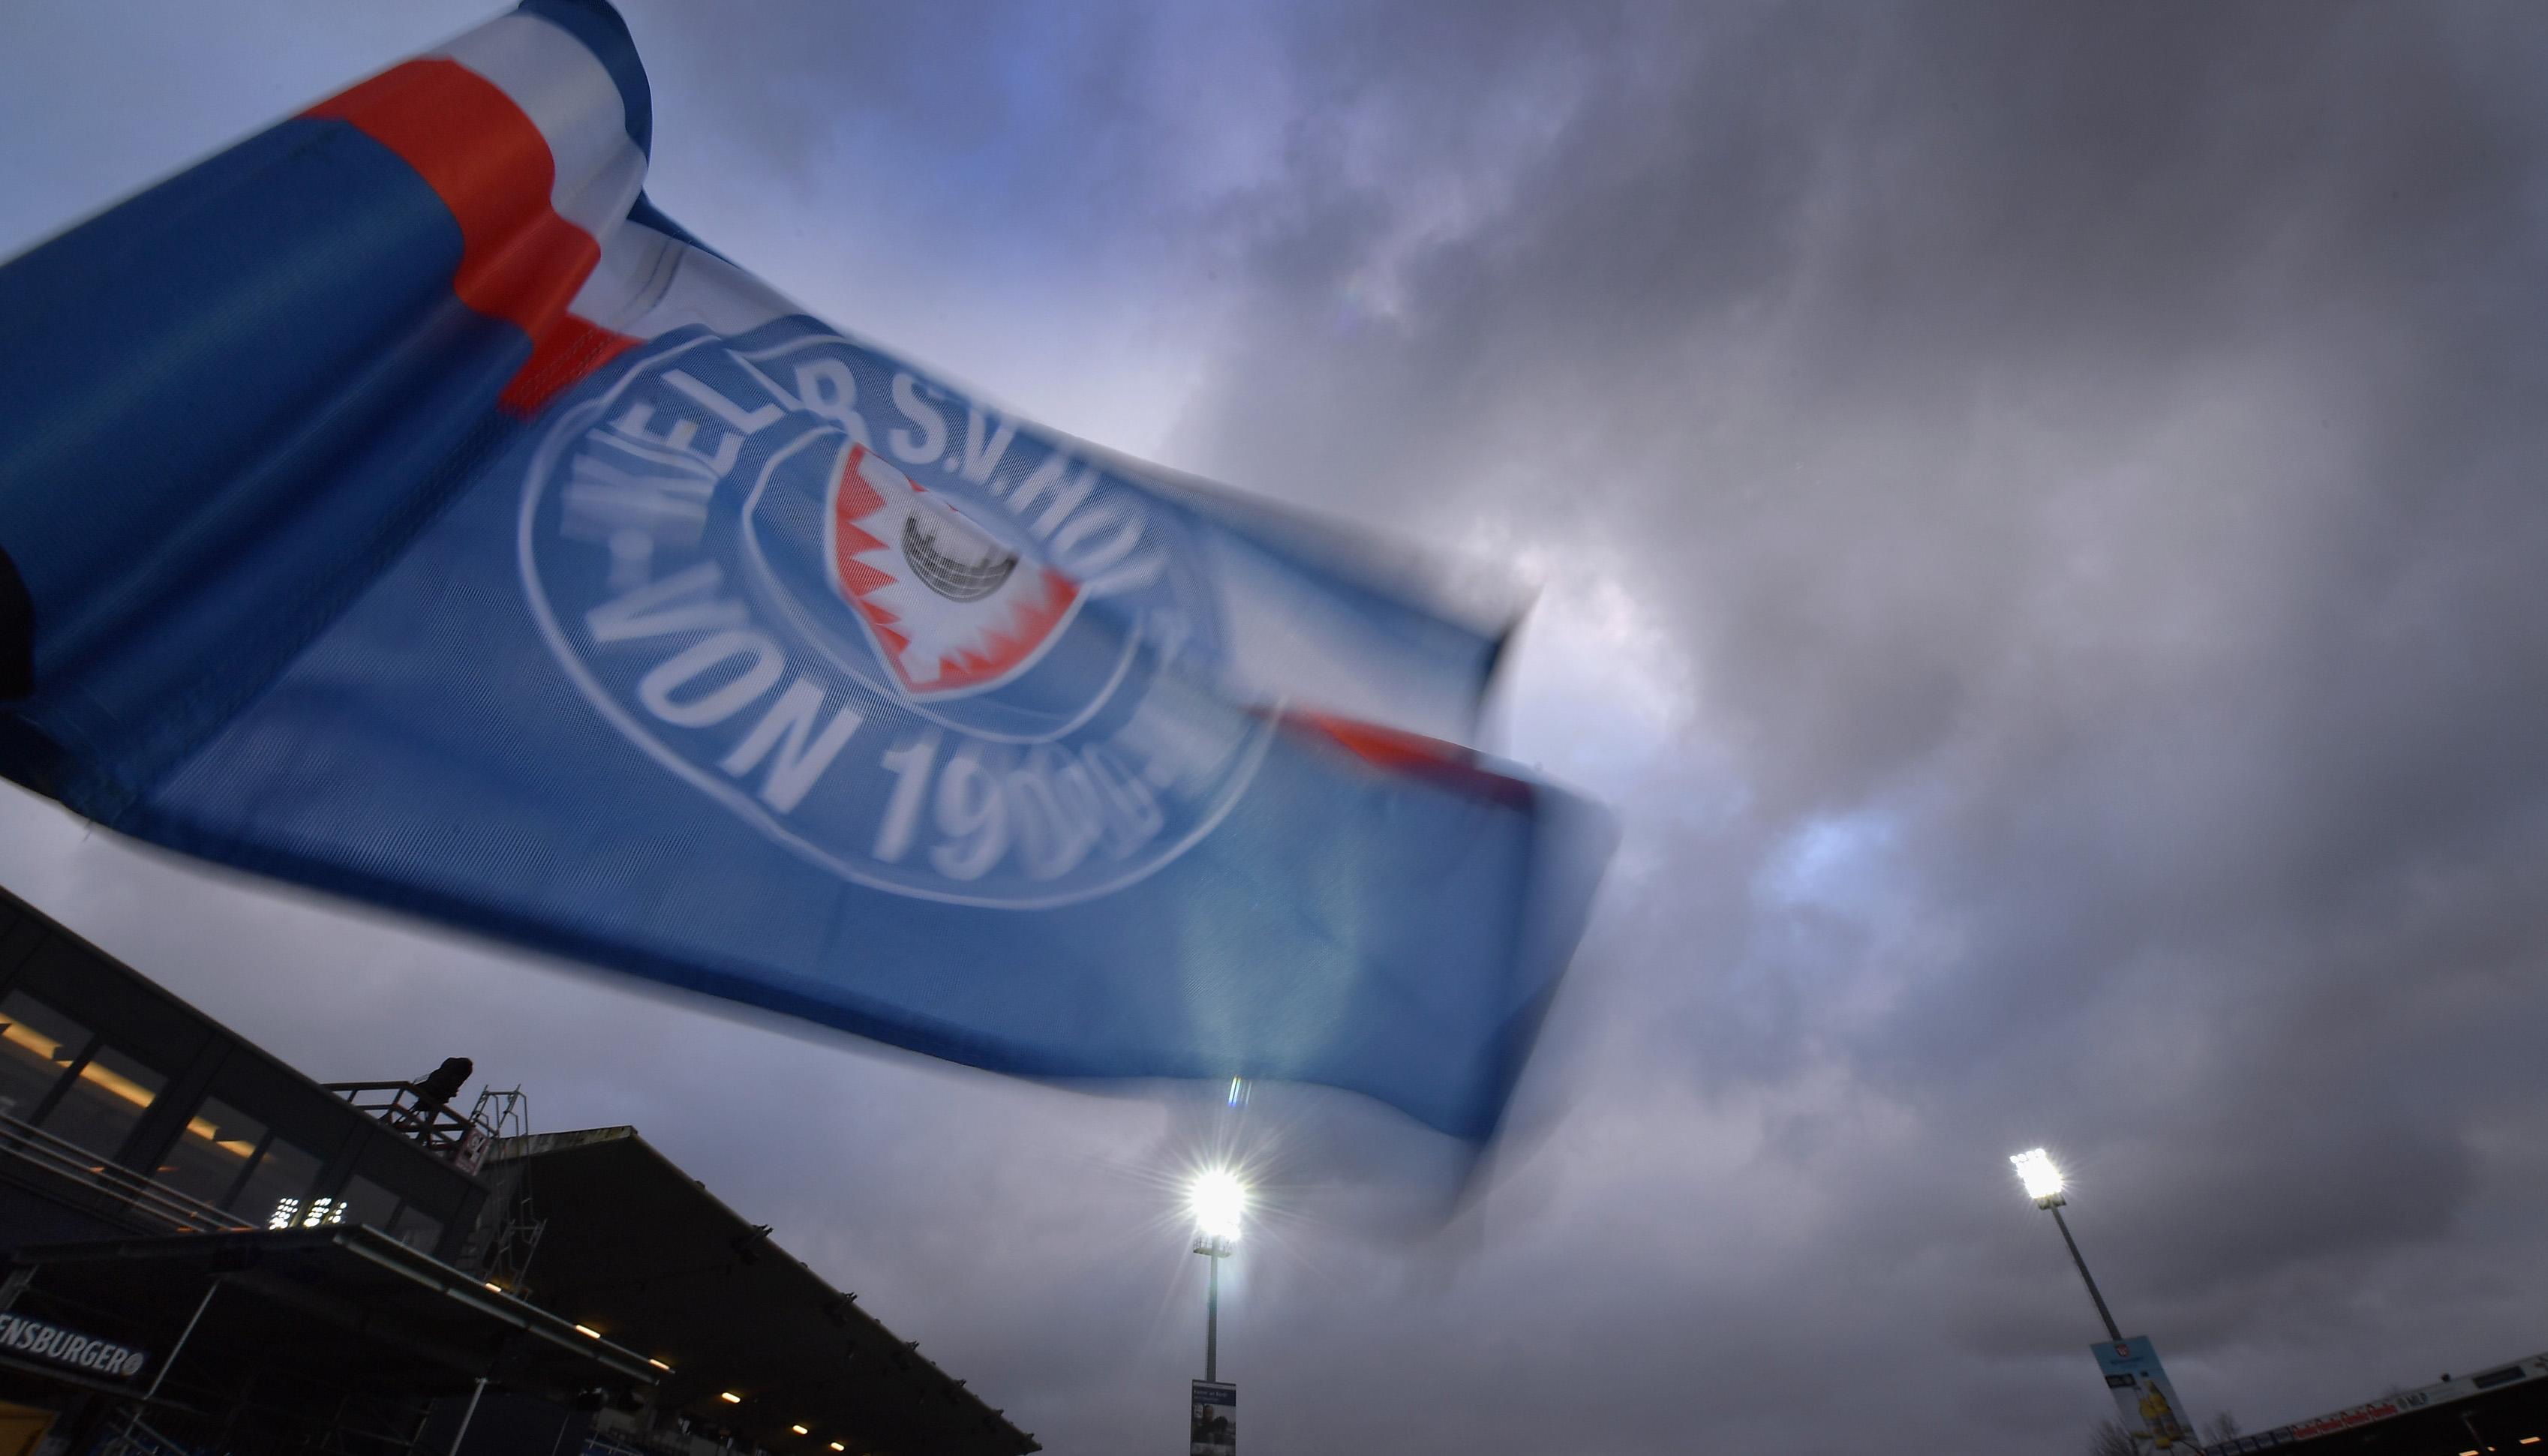 Holstein Kiel – 1. FC Nürnberg: Topspiel Richtung Bundesliga